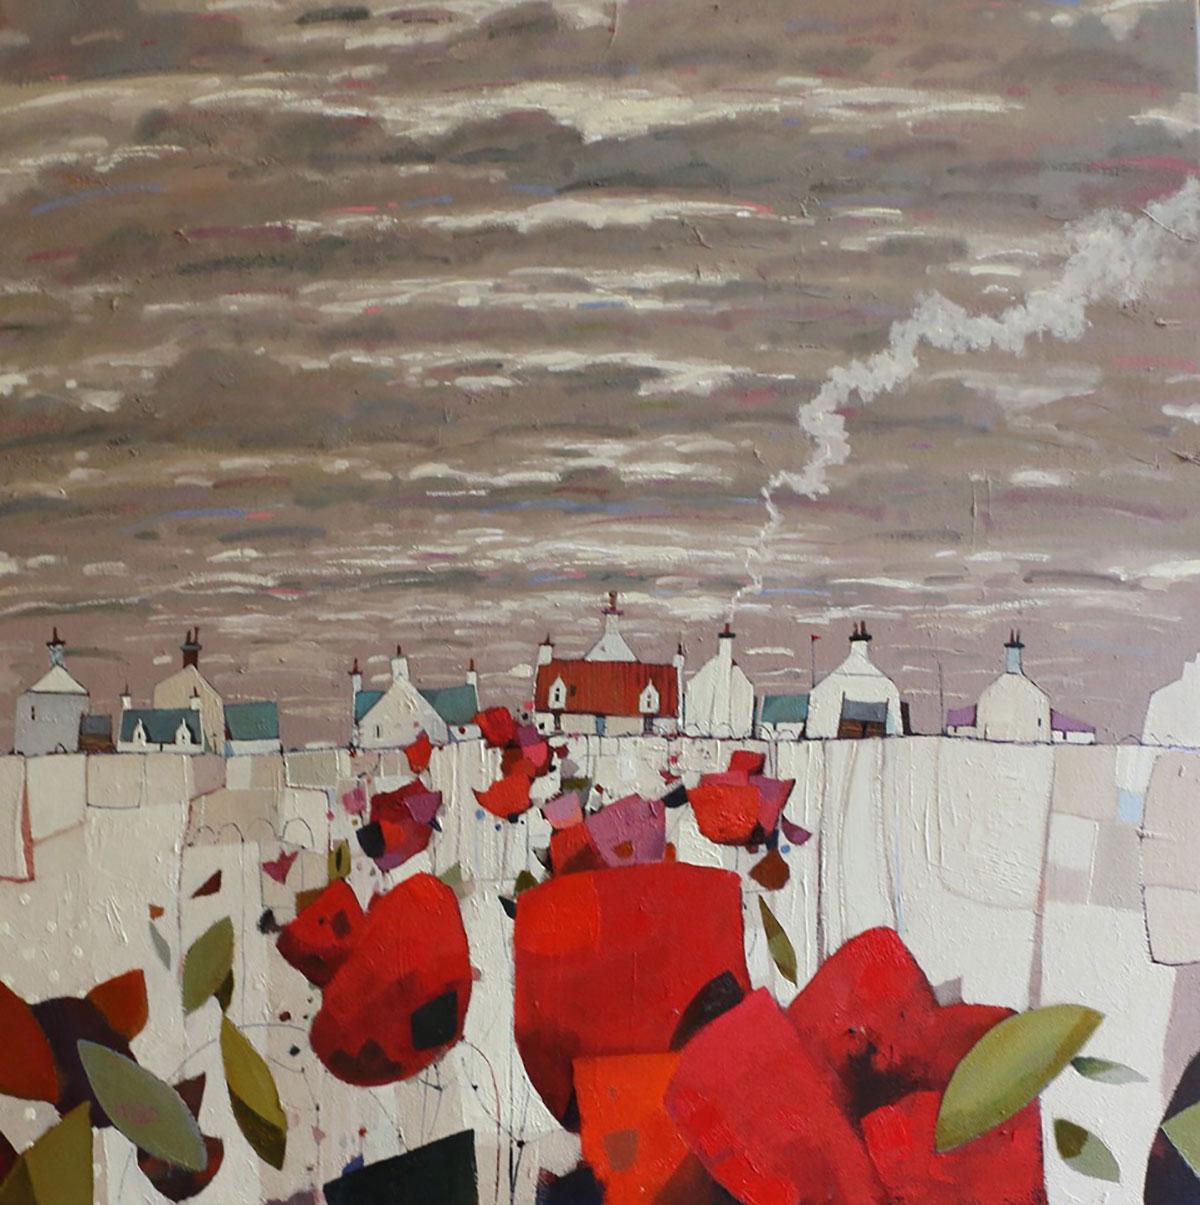 Whitehouse Gallery, Kirkcudbright: Gordon Wilson, Fifteen Years